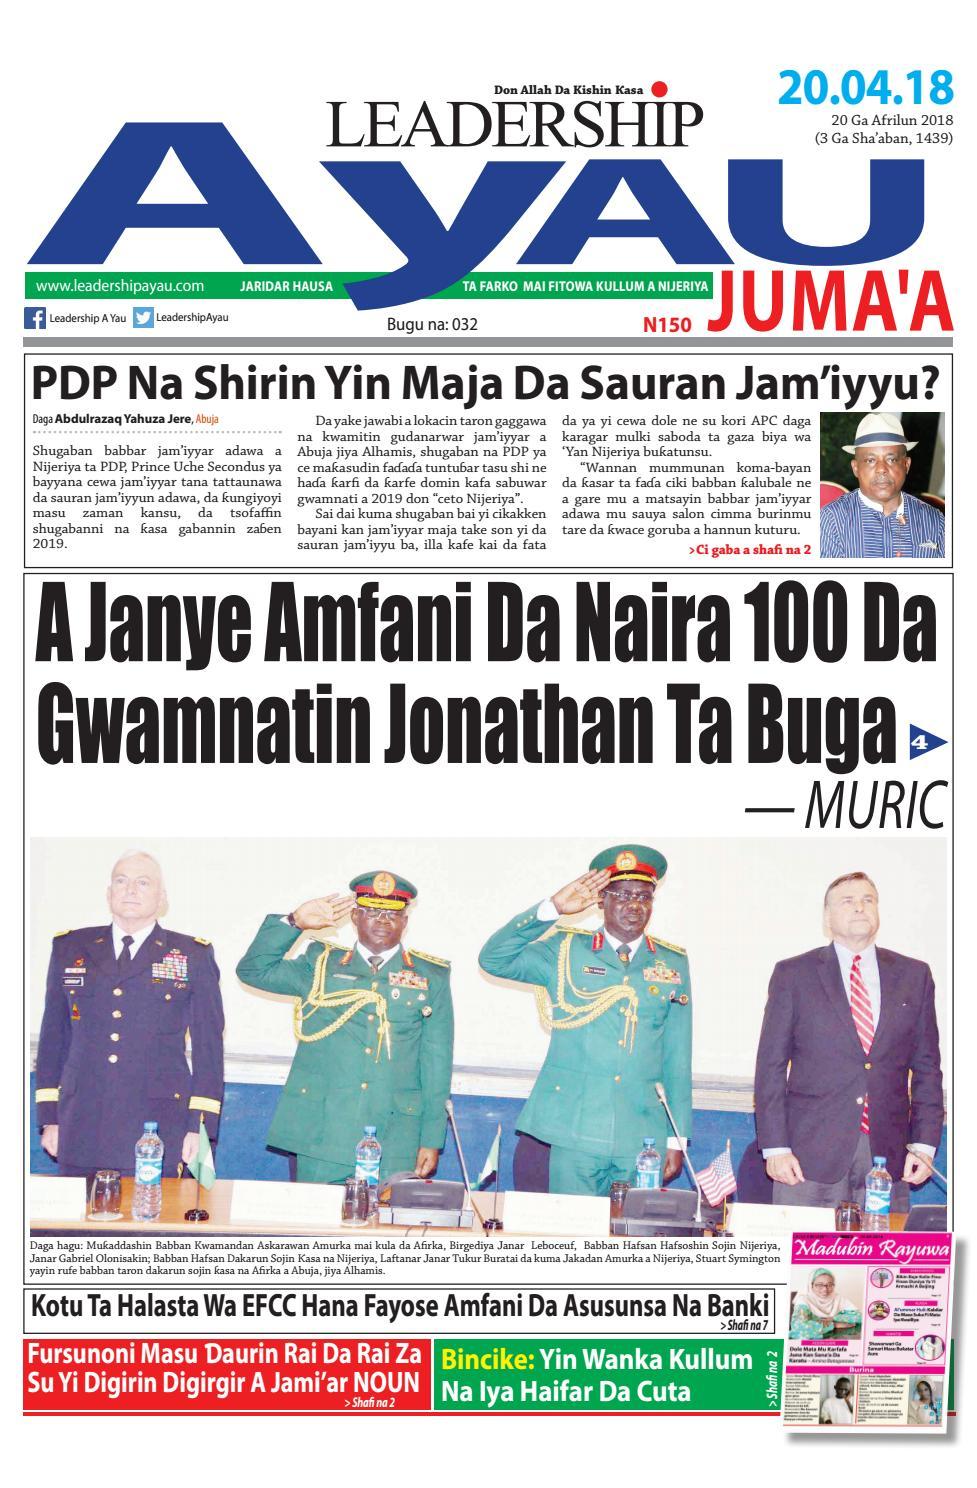 LEADERSHIP A Yau 20 Ga Afrilu 2018 by Leadership Newspapers